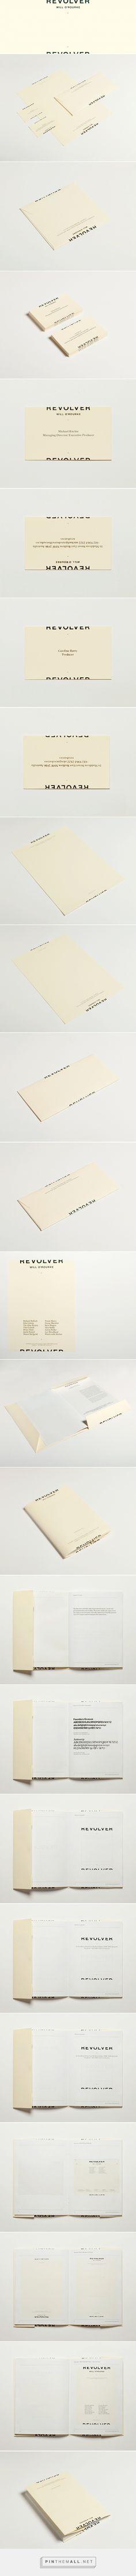 Revolver 2014 - created via https://pinthemall.net